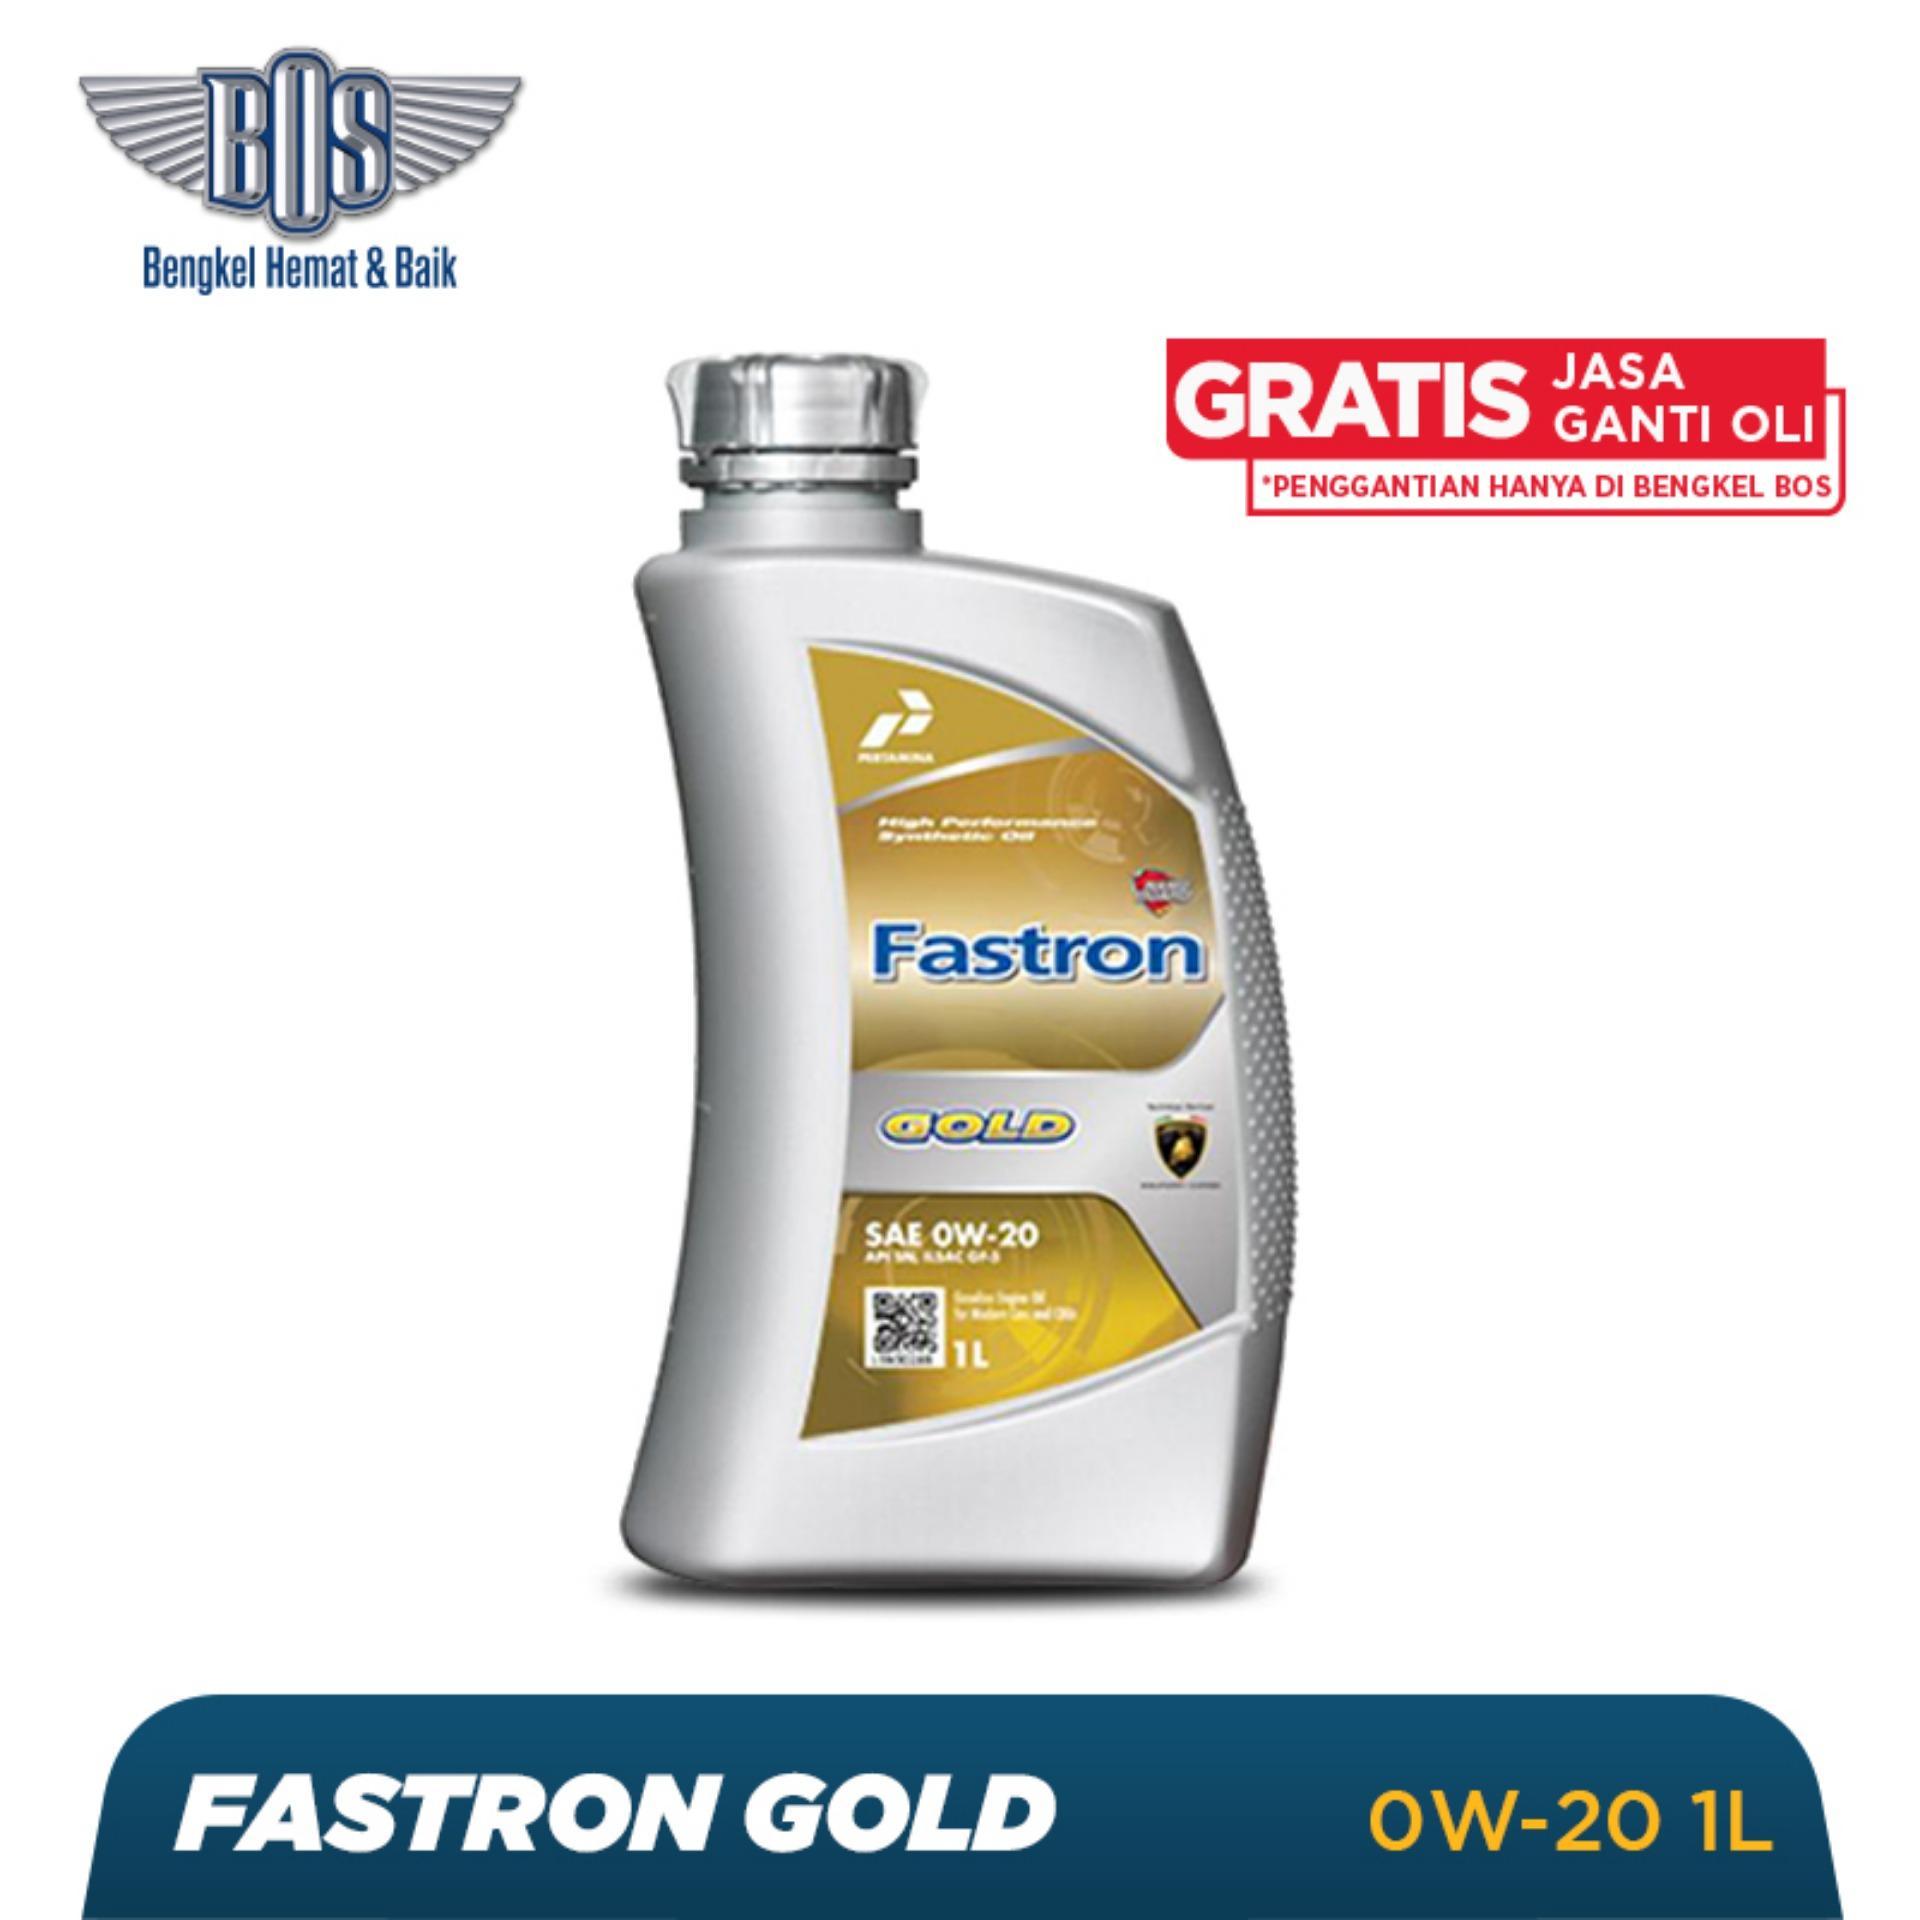 Oli Mobil Fastron Gold  - 0W-20 - LITER -  Gratis Jasa Ganti Oli dan Check Up Kendaraan